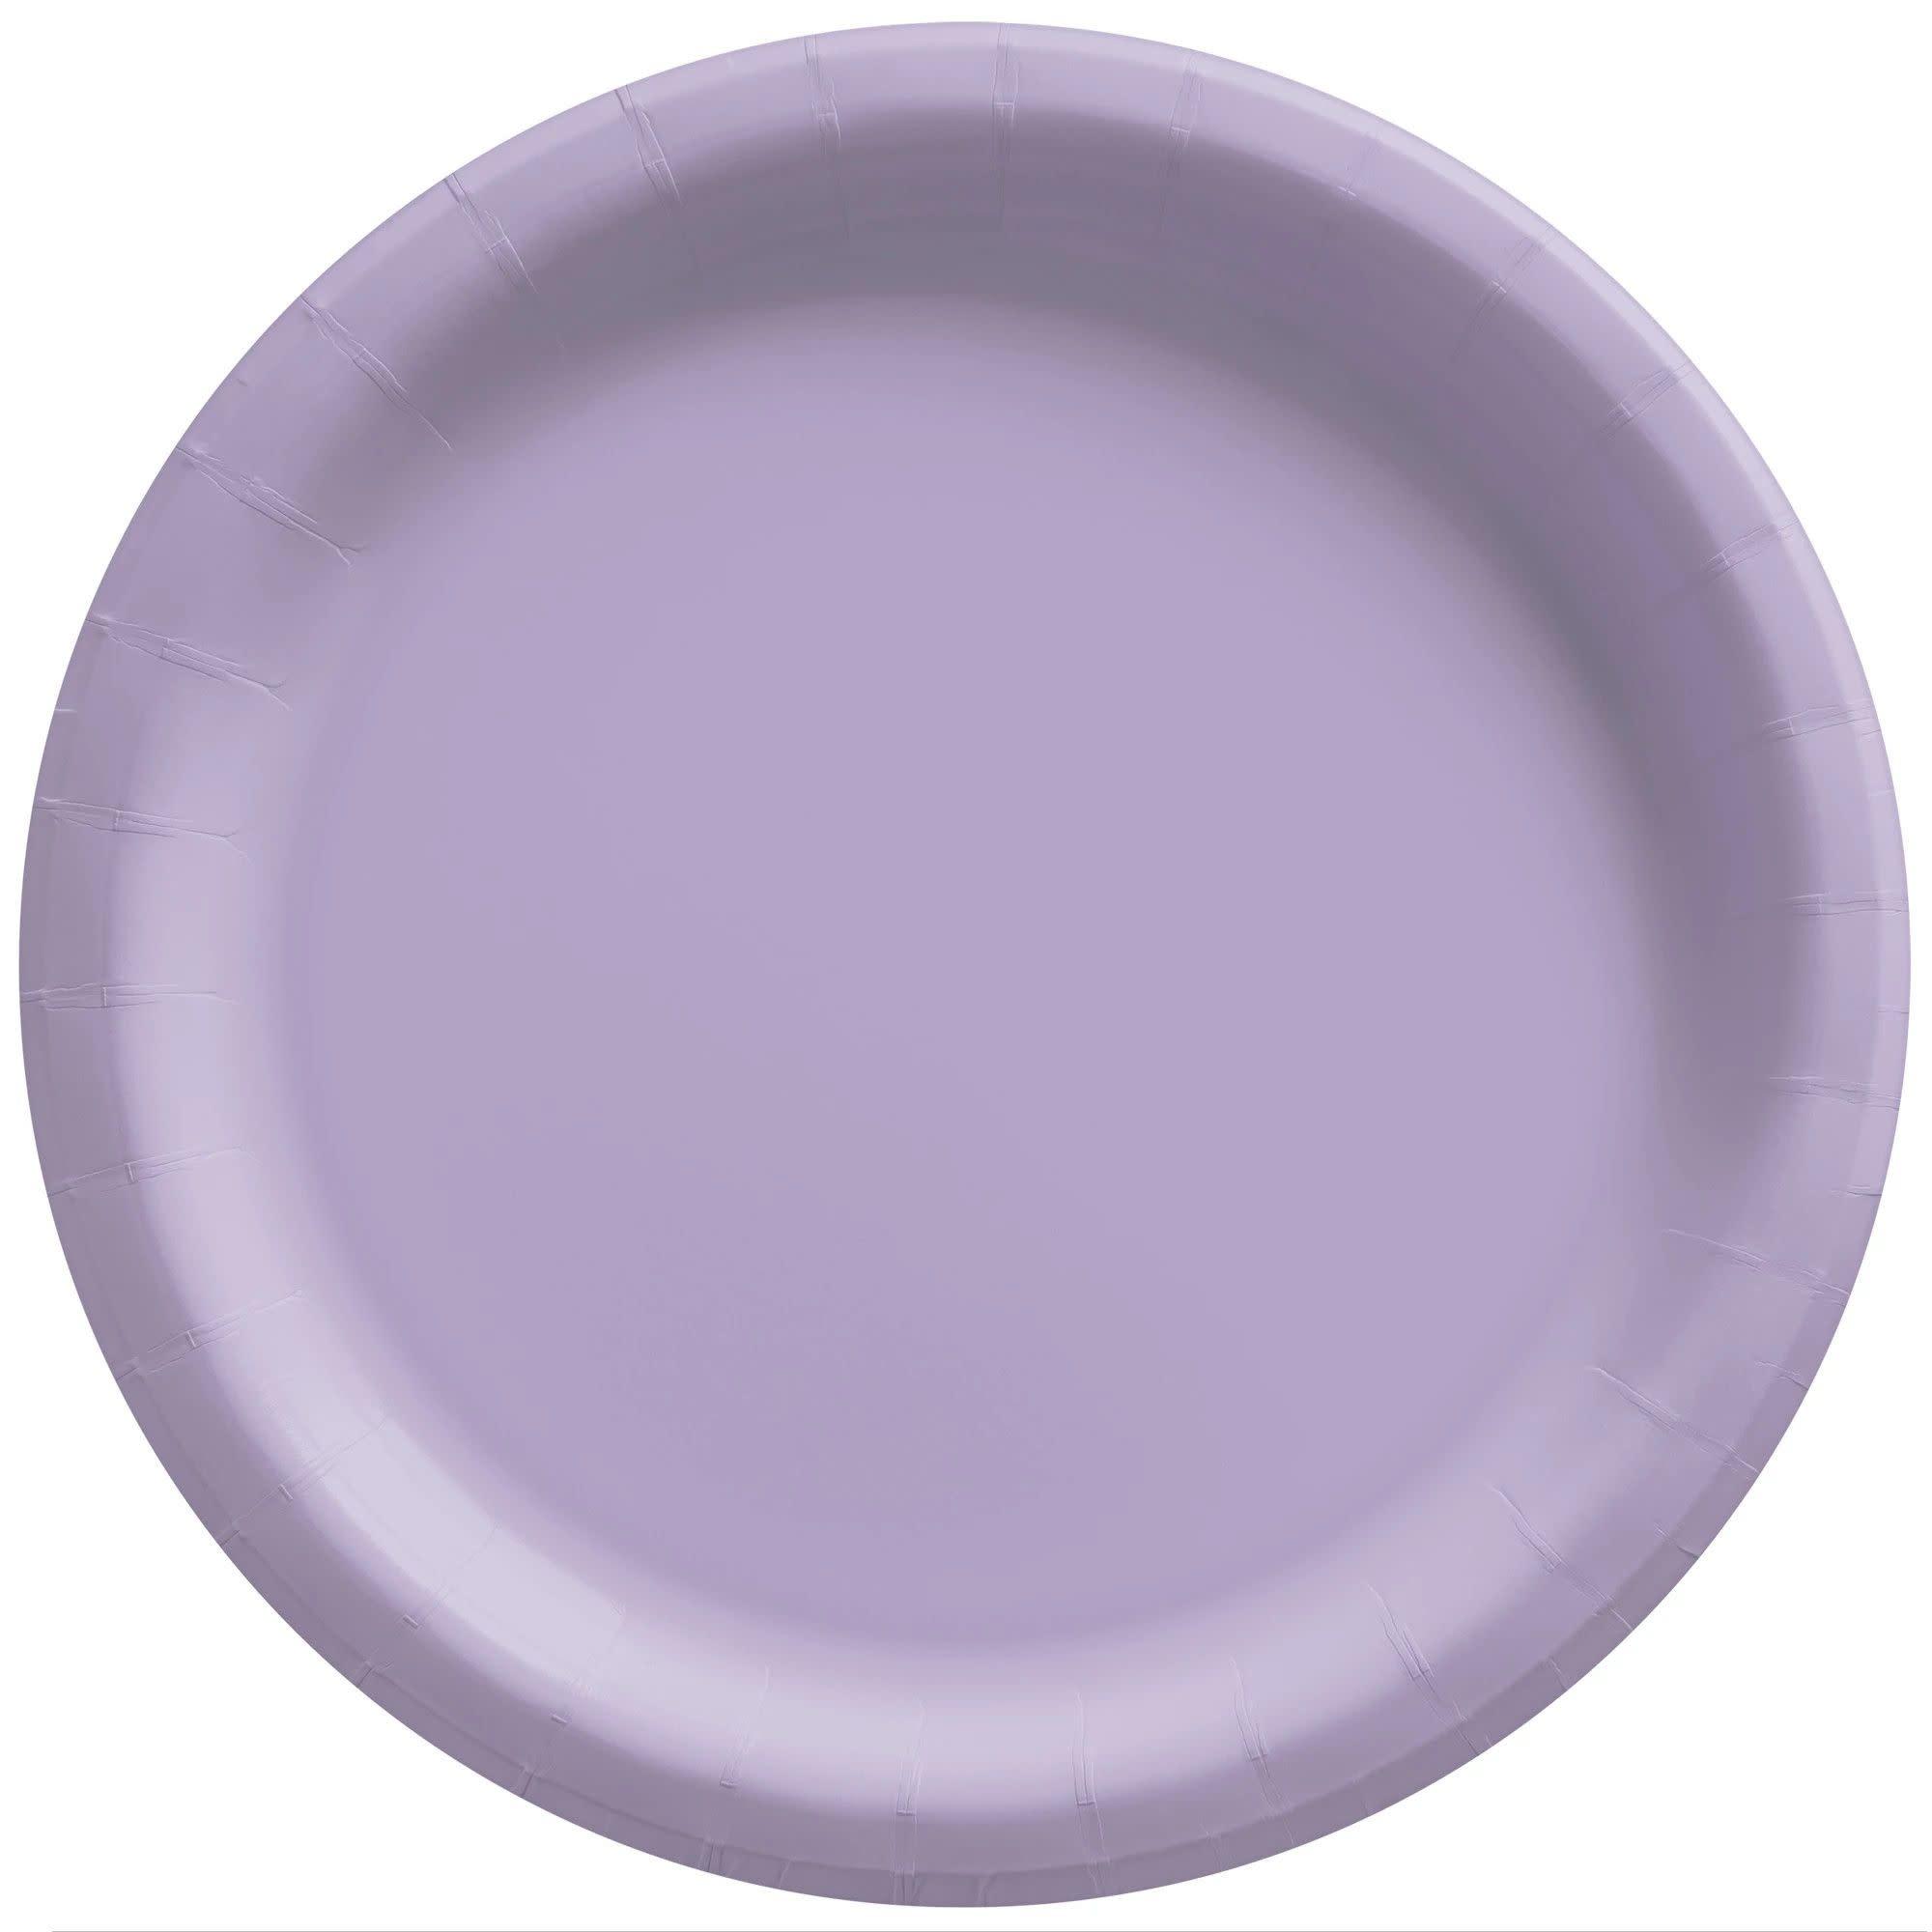 "6 3/4"" Round Paper Plates, Mid Ct. - Lavender"